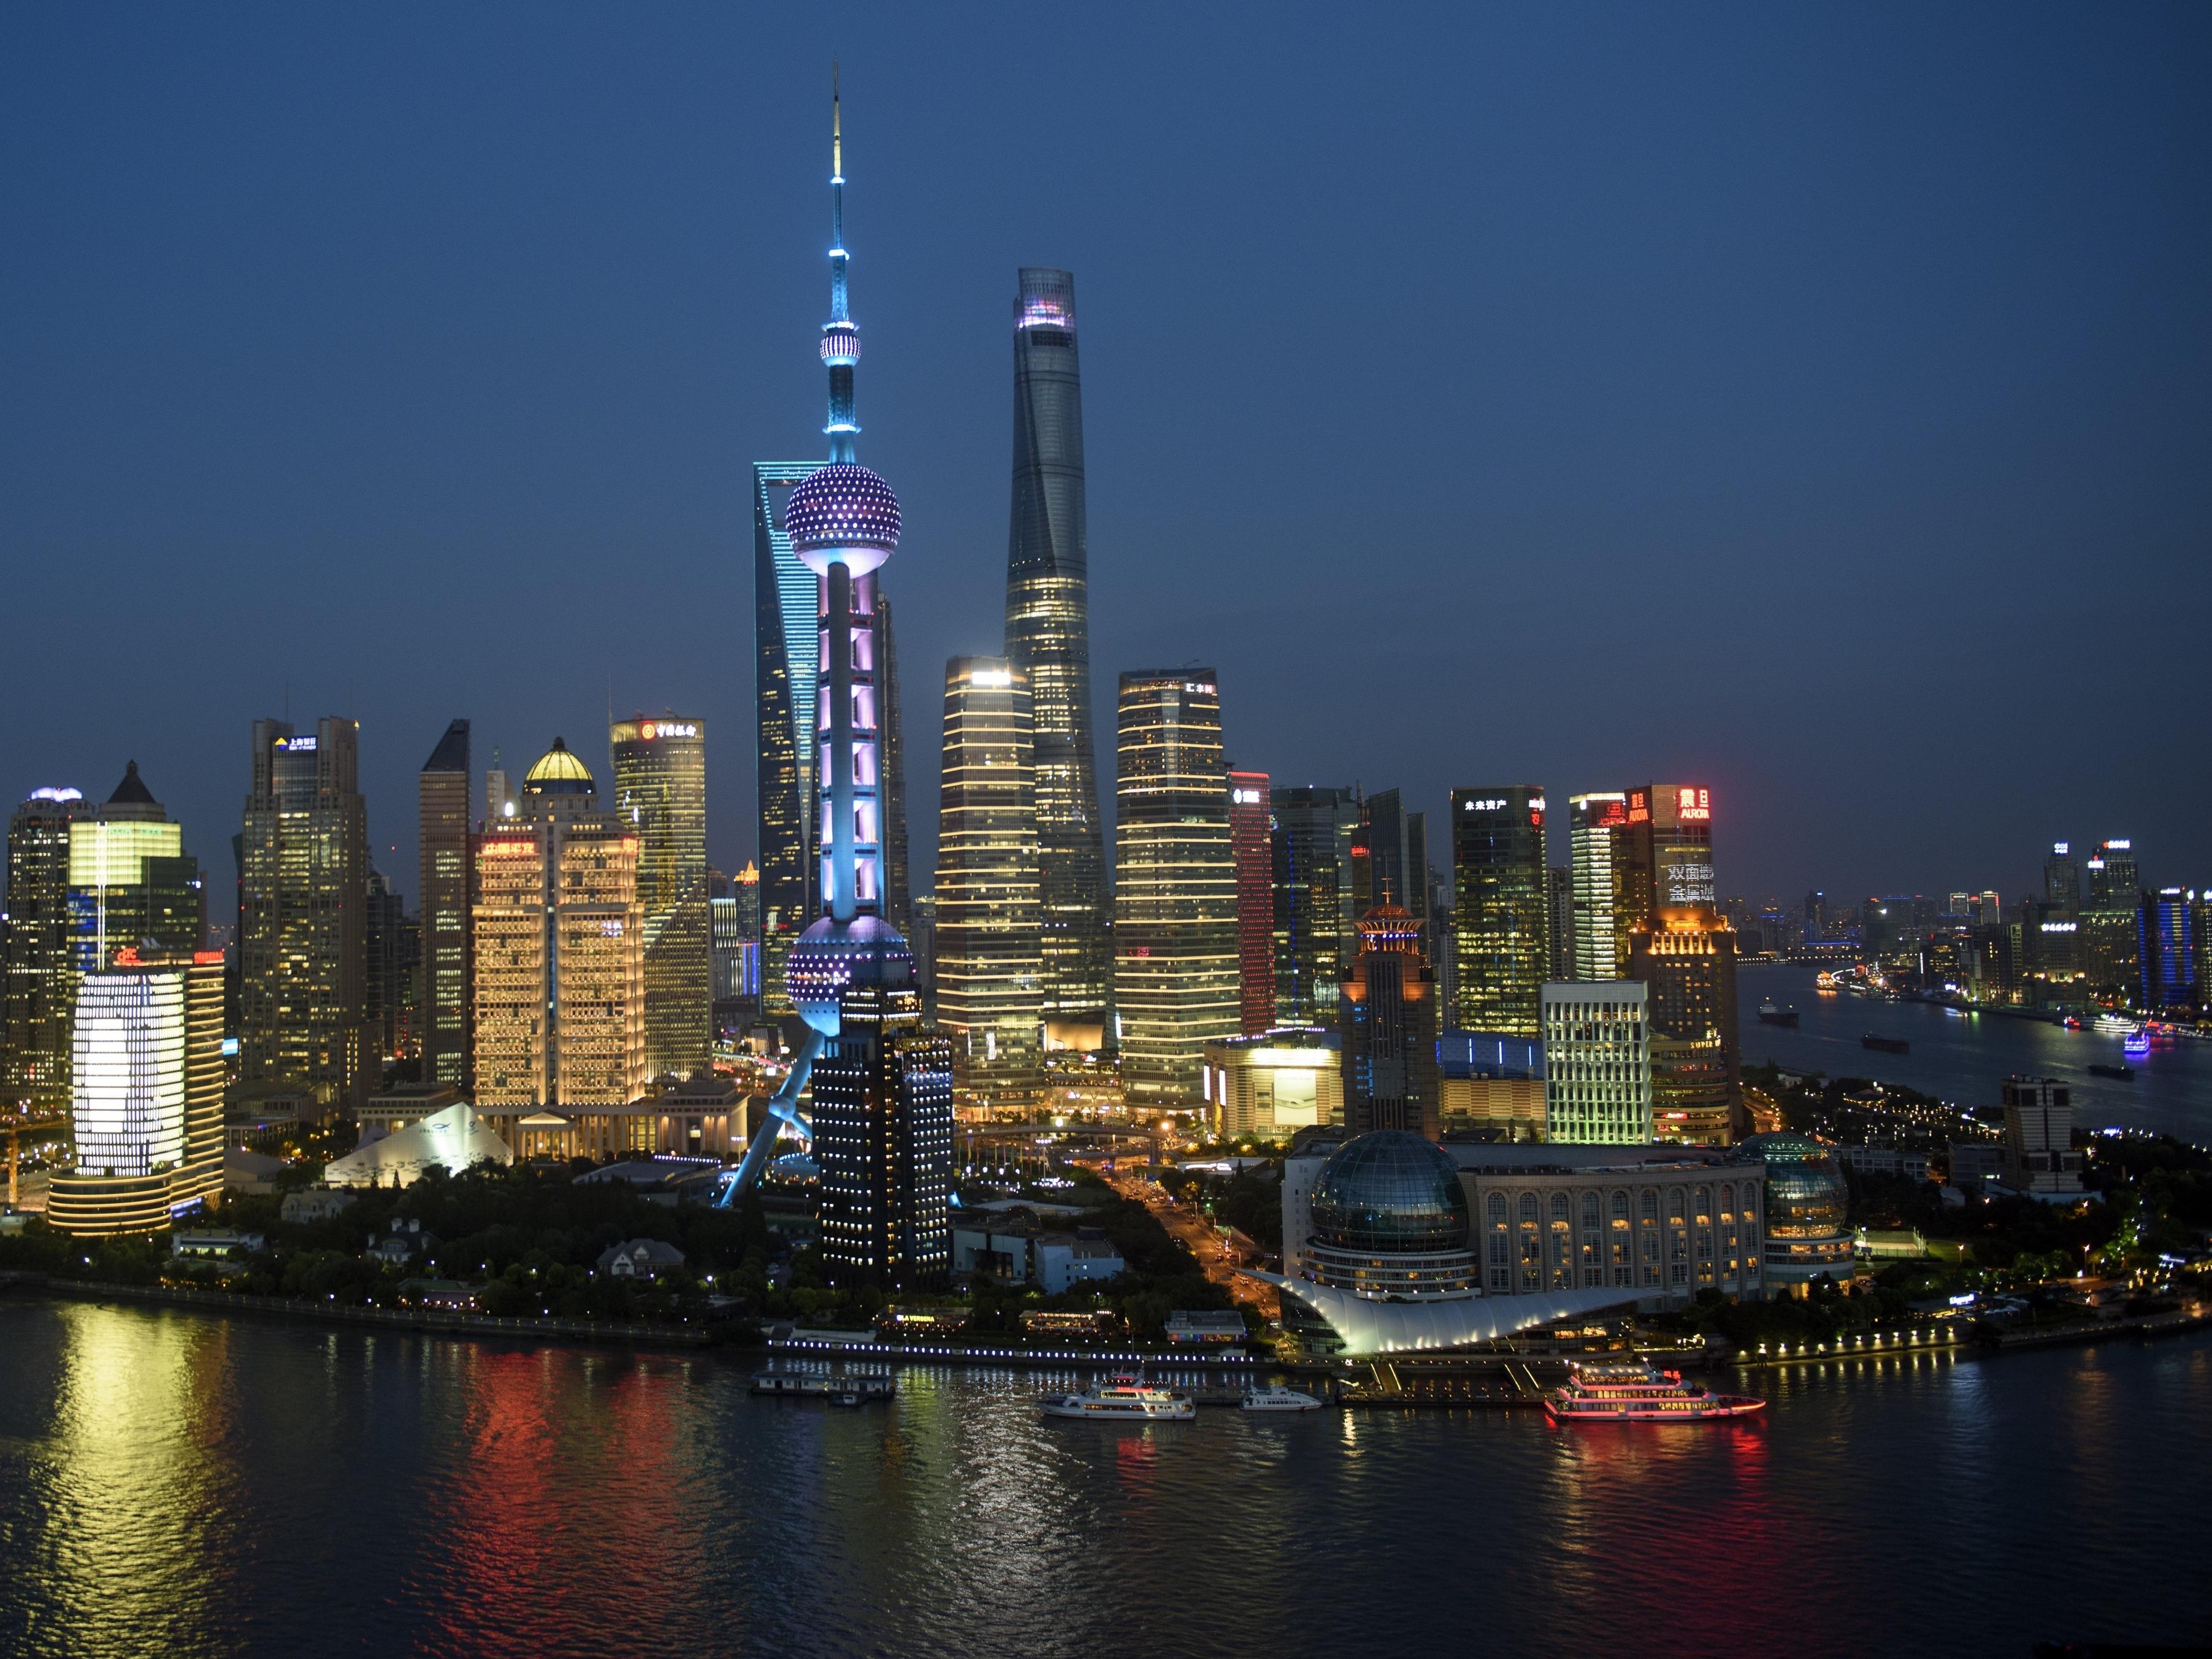 Sluggish Economy Doesn't Dampen Shanghai's Housing Prices